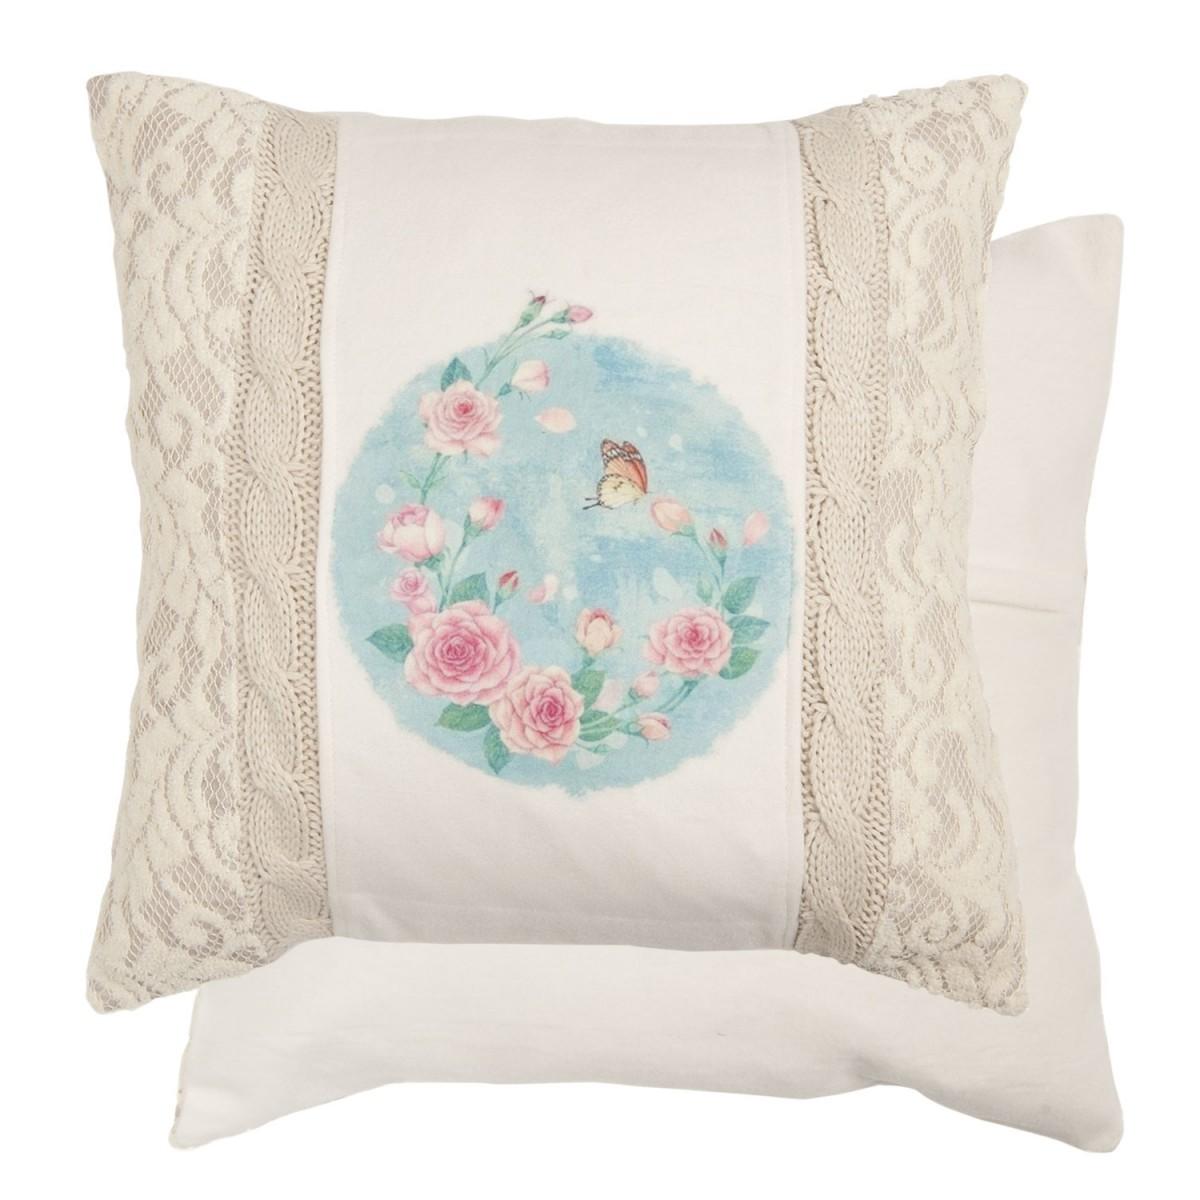 clayre eef kissenh lle strick filz kissen rose schmetterling 45x45cm wohntextilien kissen. Black Bedroom Furniture Sets. Home Design Ideas